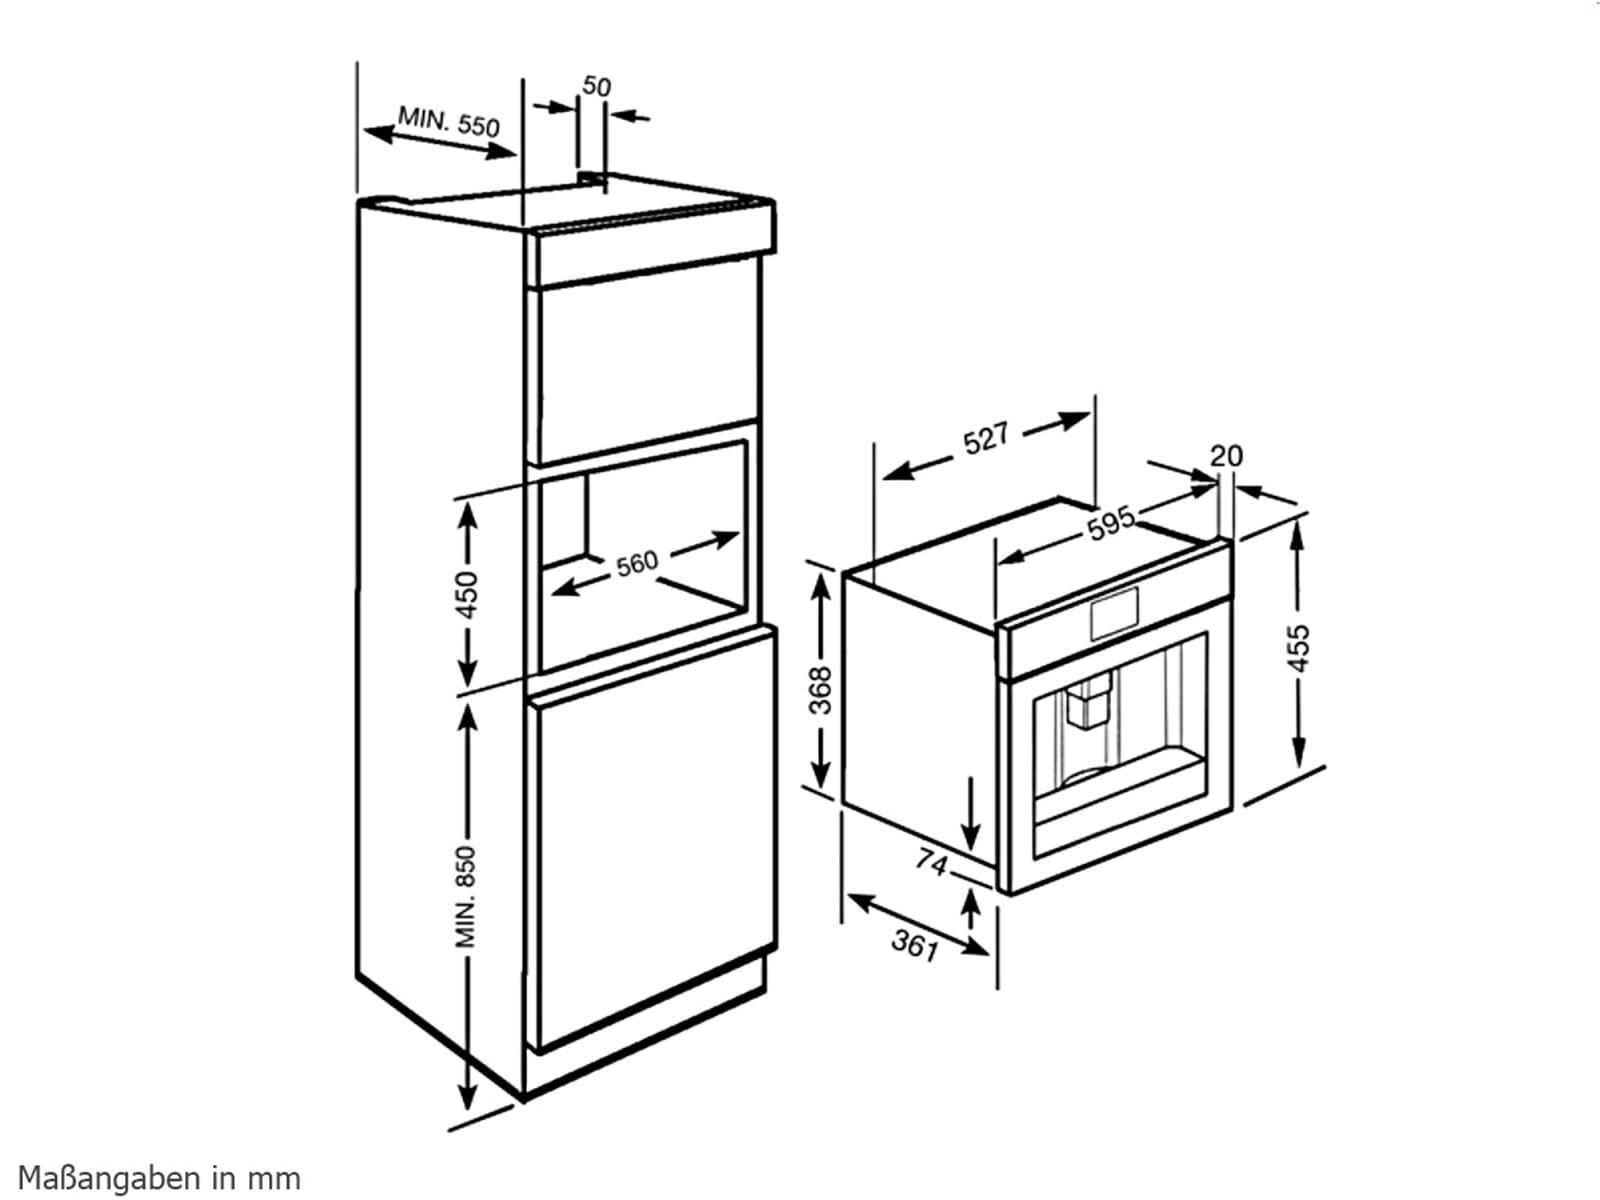 Smeg CMSC451 Einbau-Espresso-/Kaffeevollautomat Edelstahl